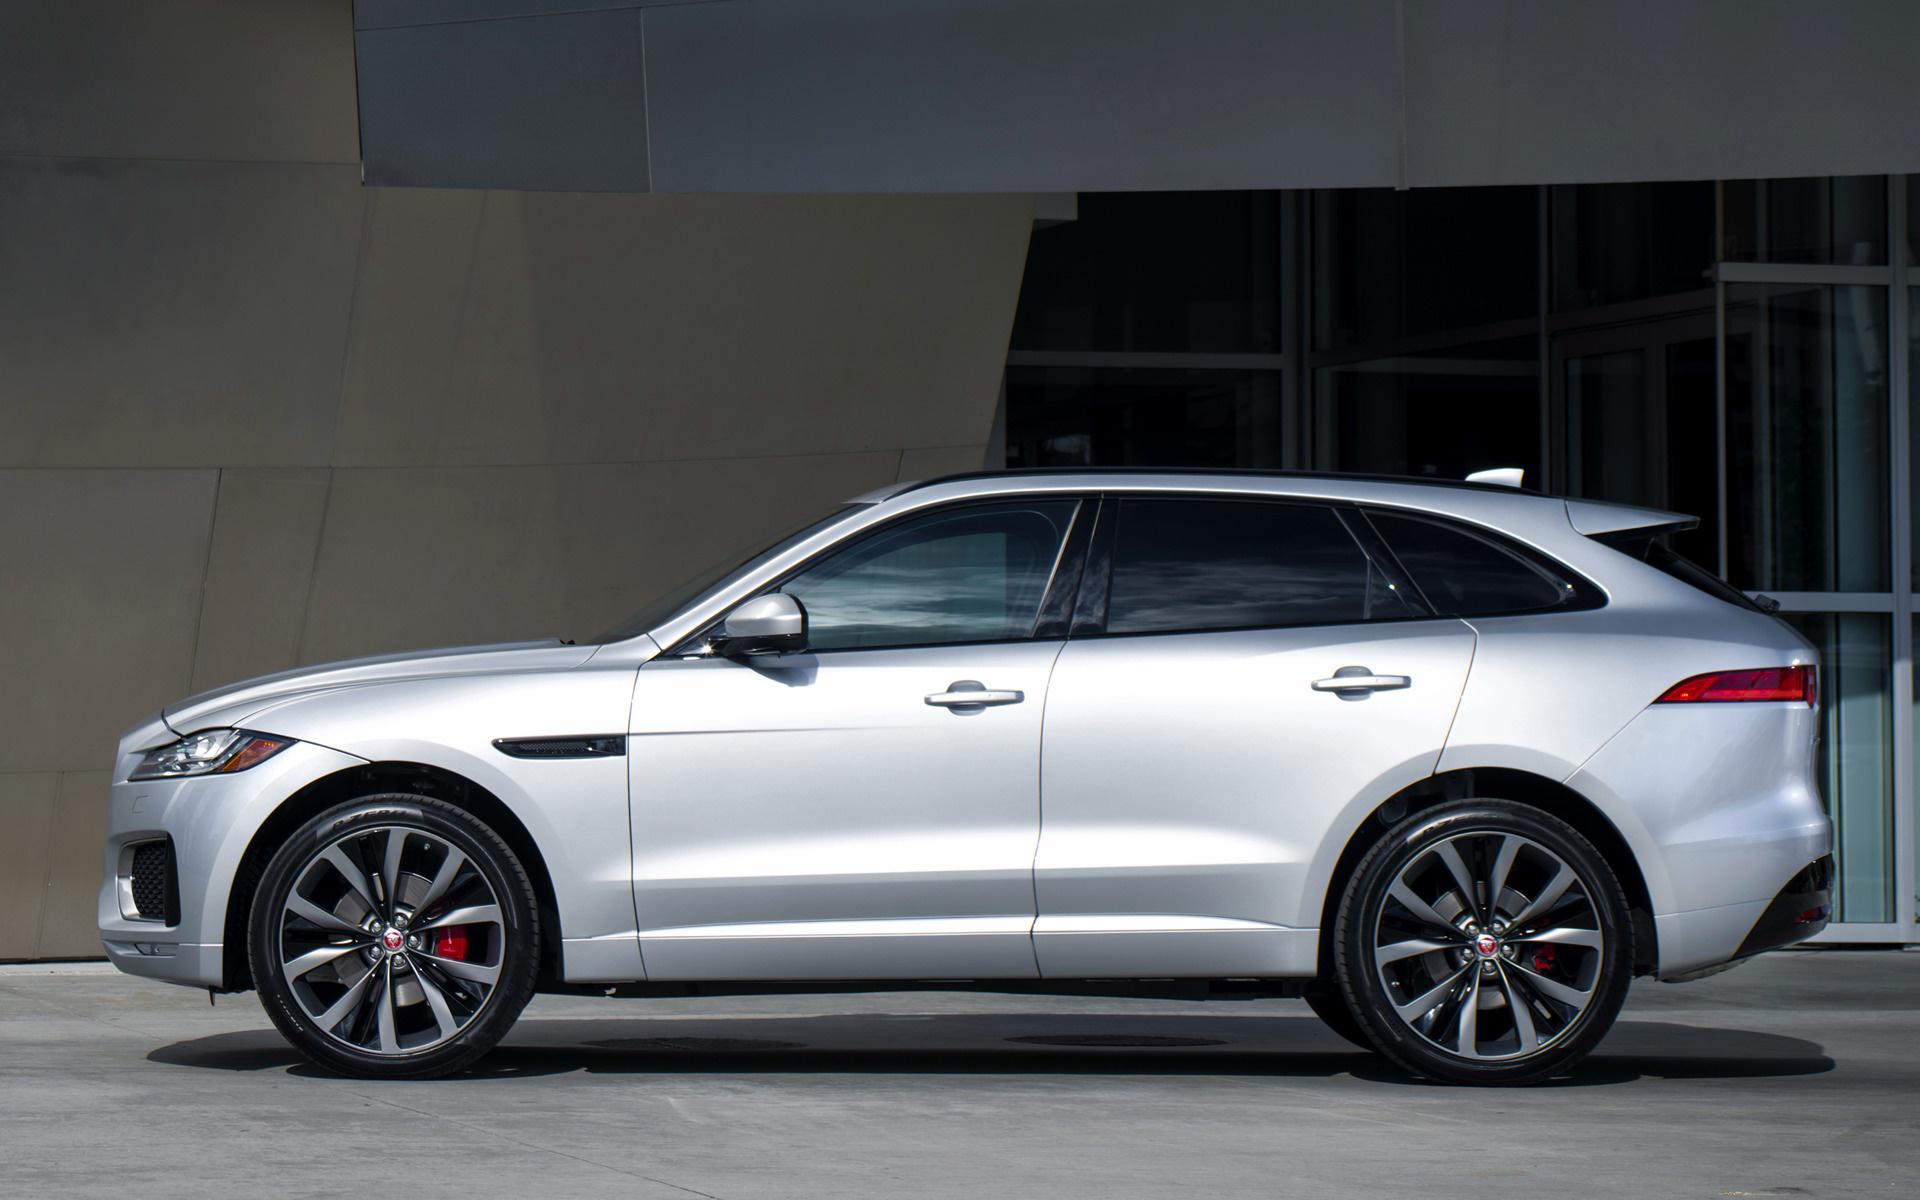 Jaguar F Pace White Interior >> Jaguar F-Pace S (2017) US Wallpapers and HD Images - Car Pixel